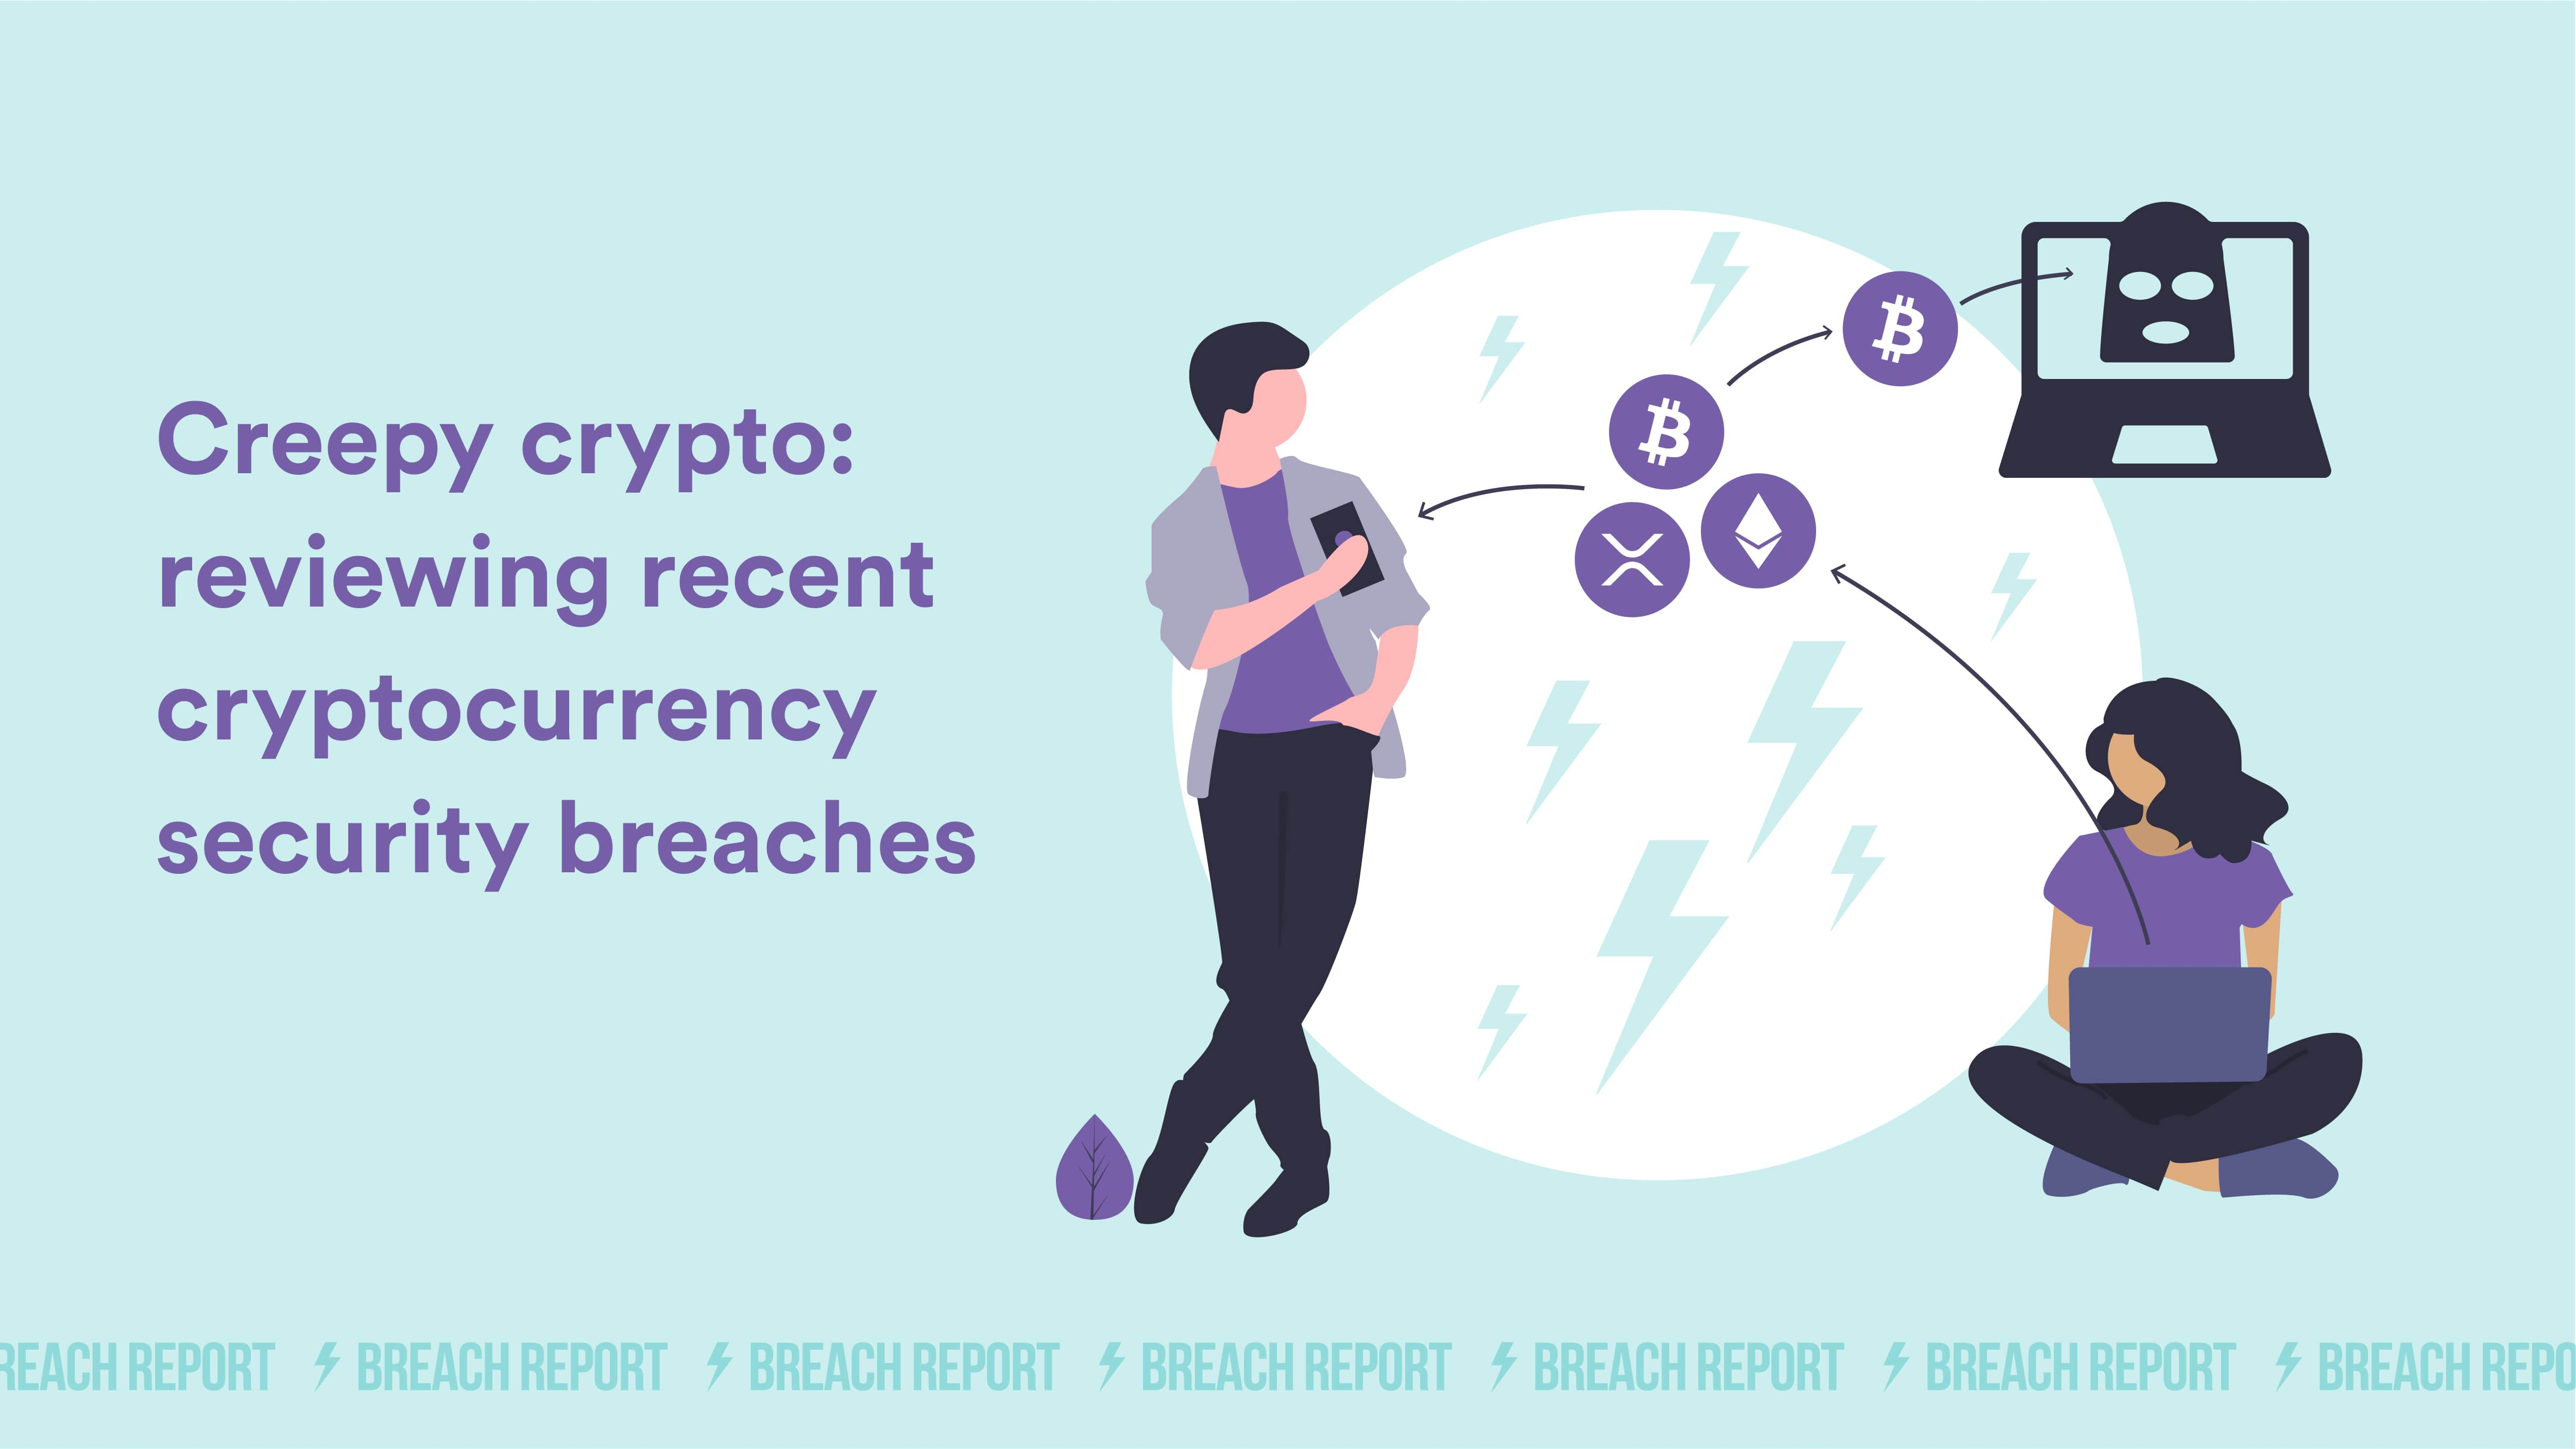 cybersec bitcoin breach report news 2020 data leak